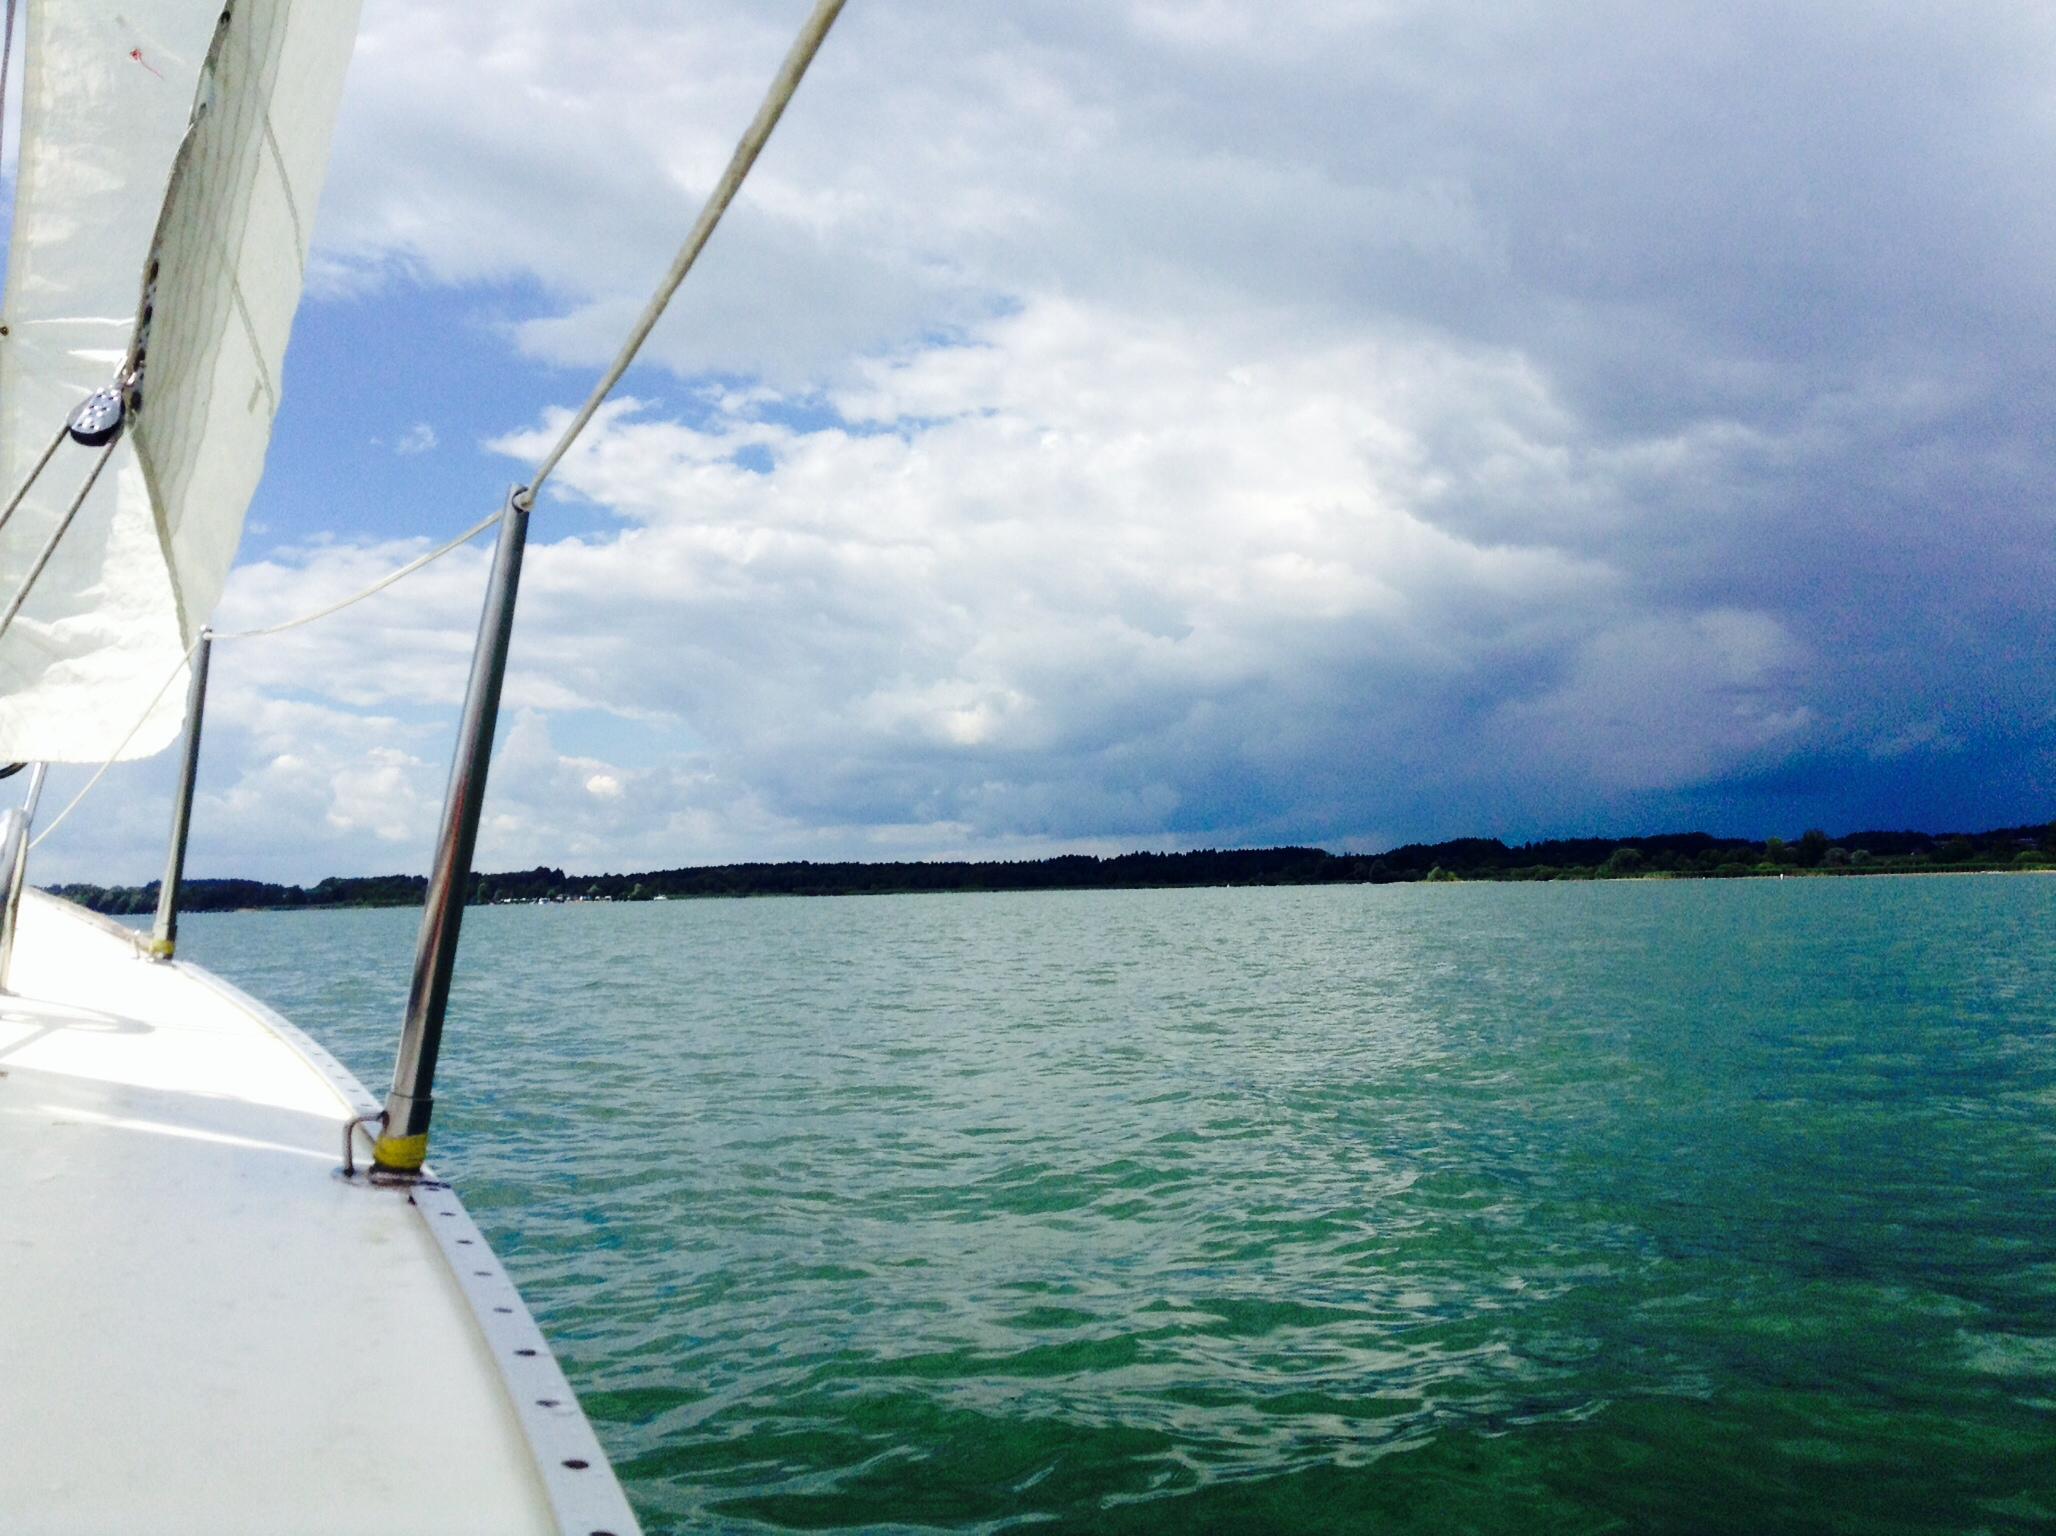 sailing on chiemsee